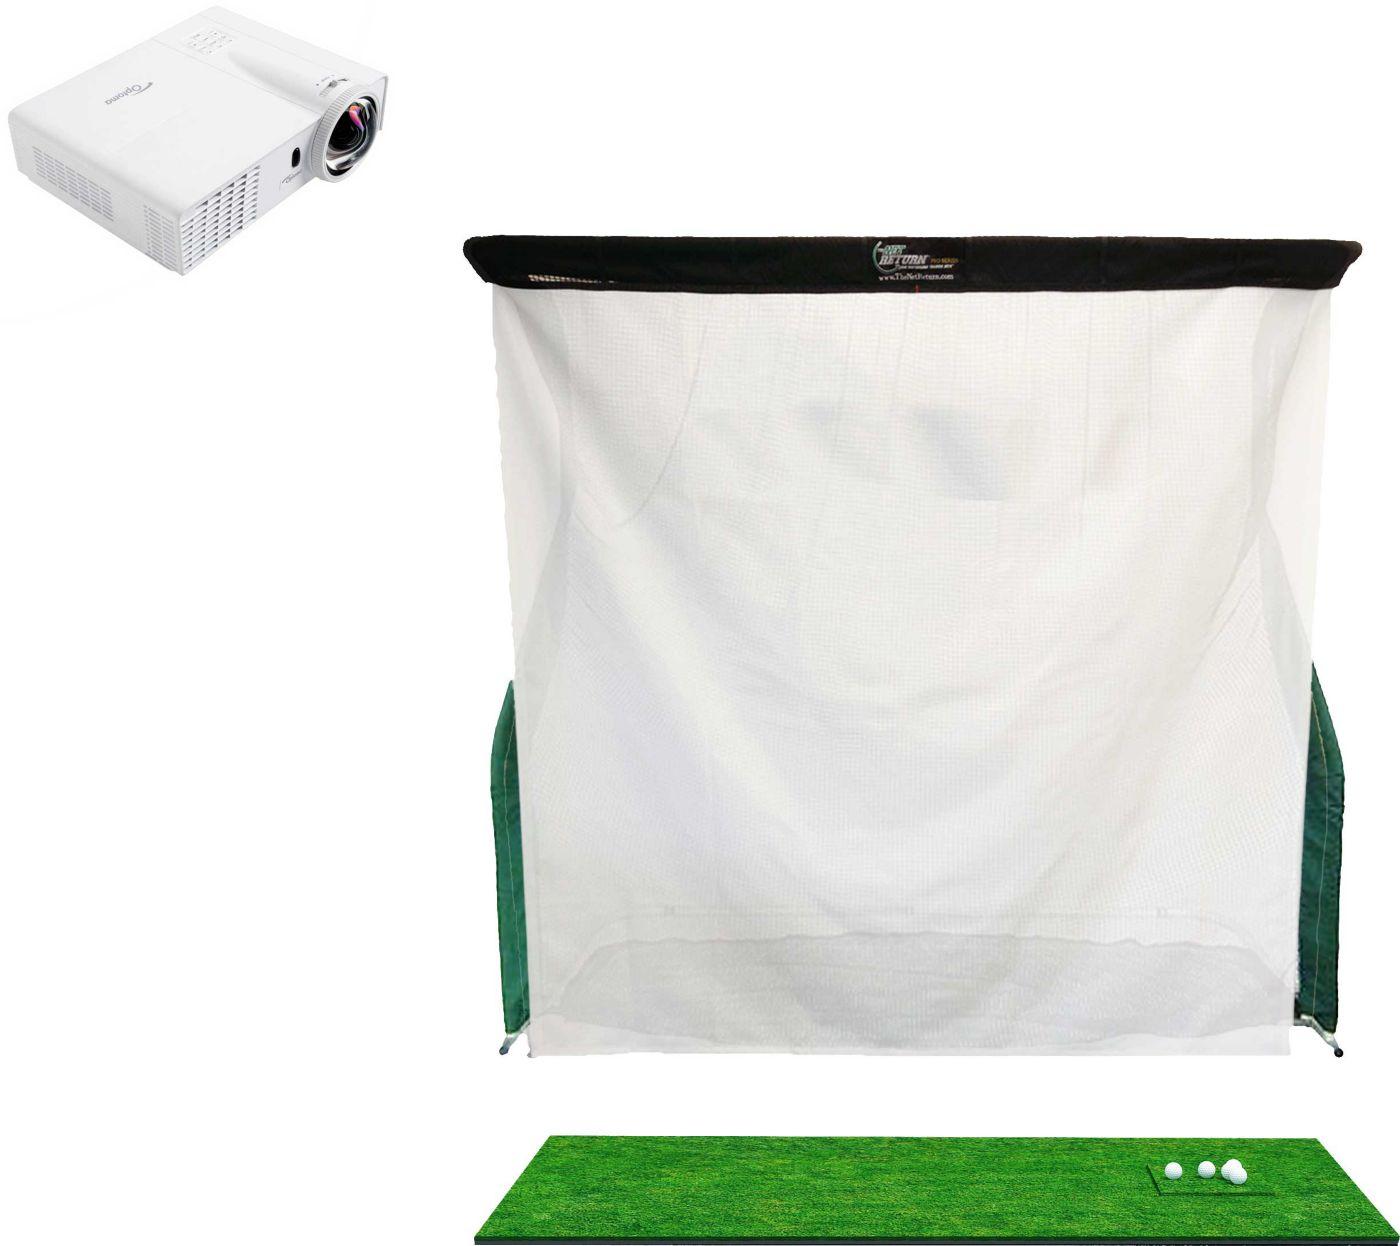 OptiShot Golf-In-A-Box 3 Golf Simulation Kit